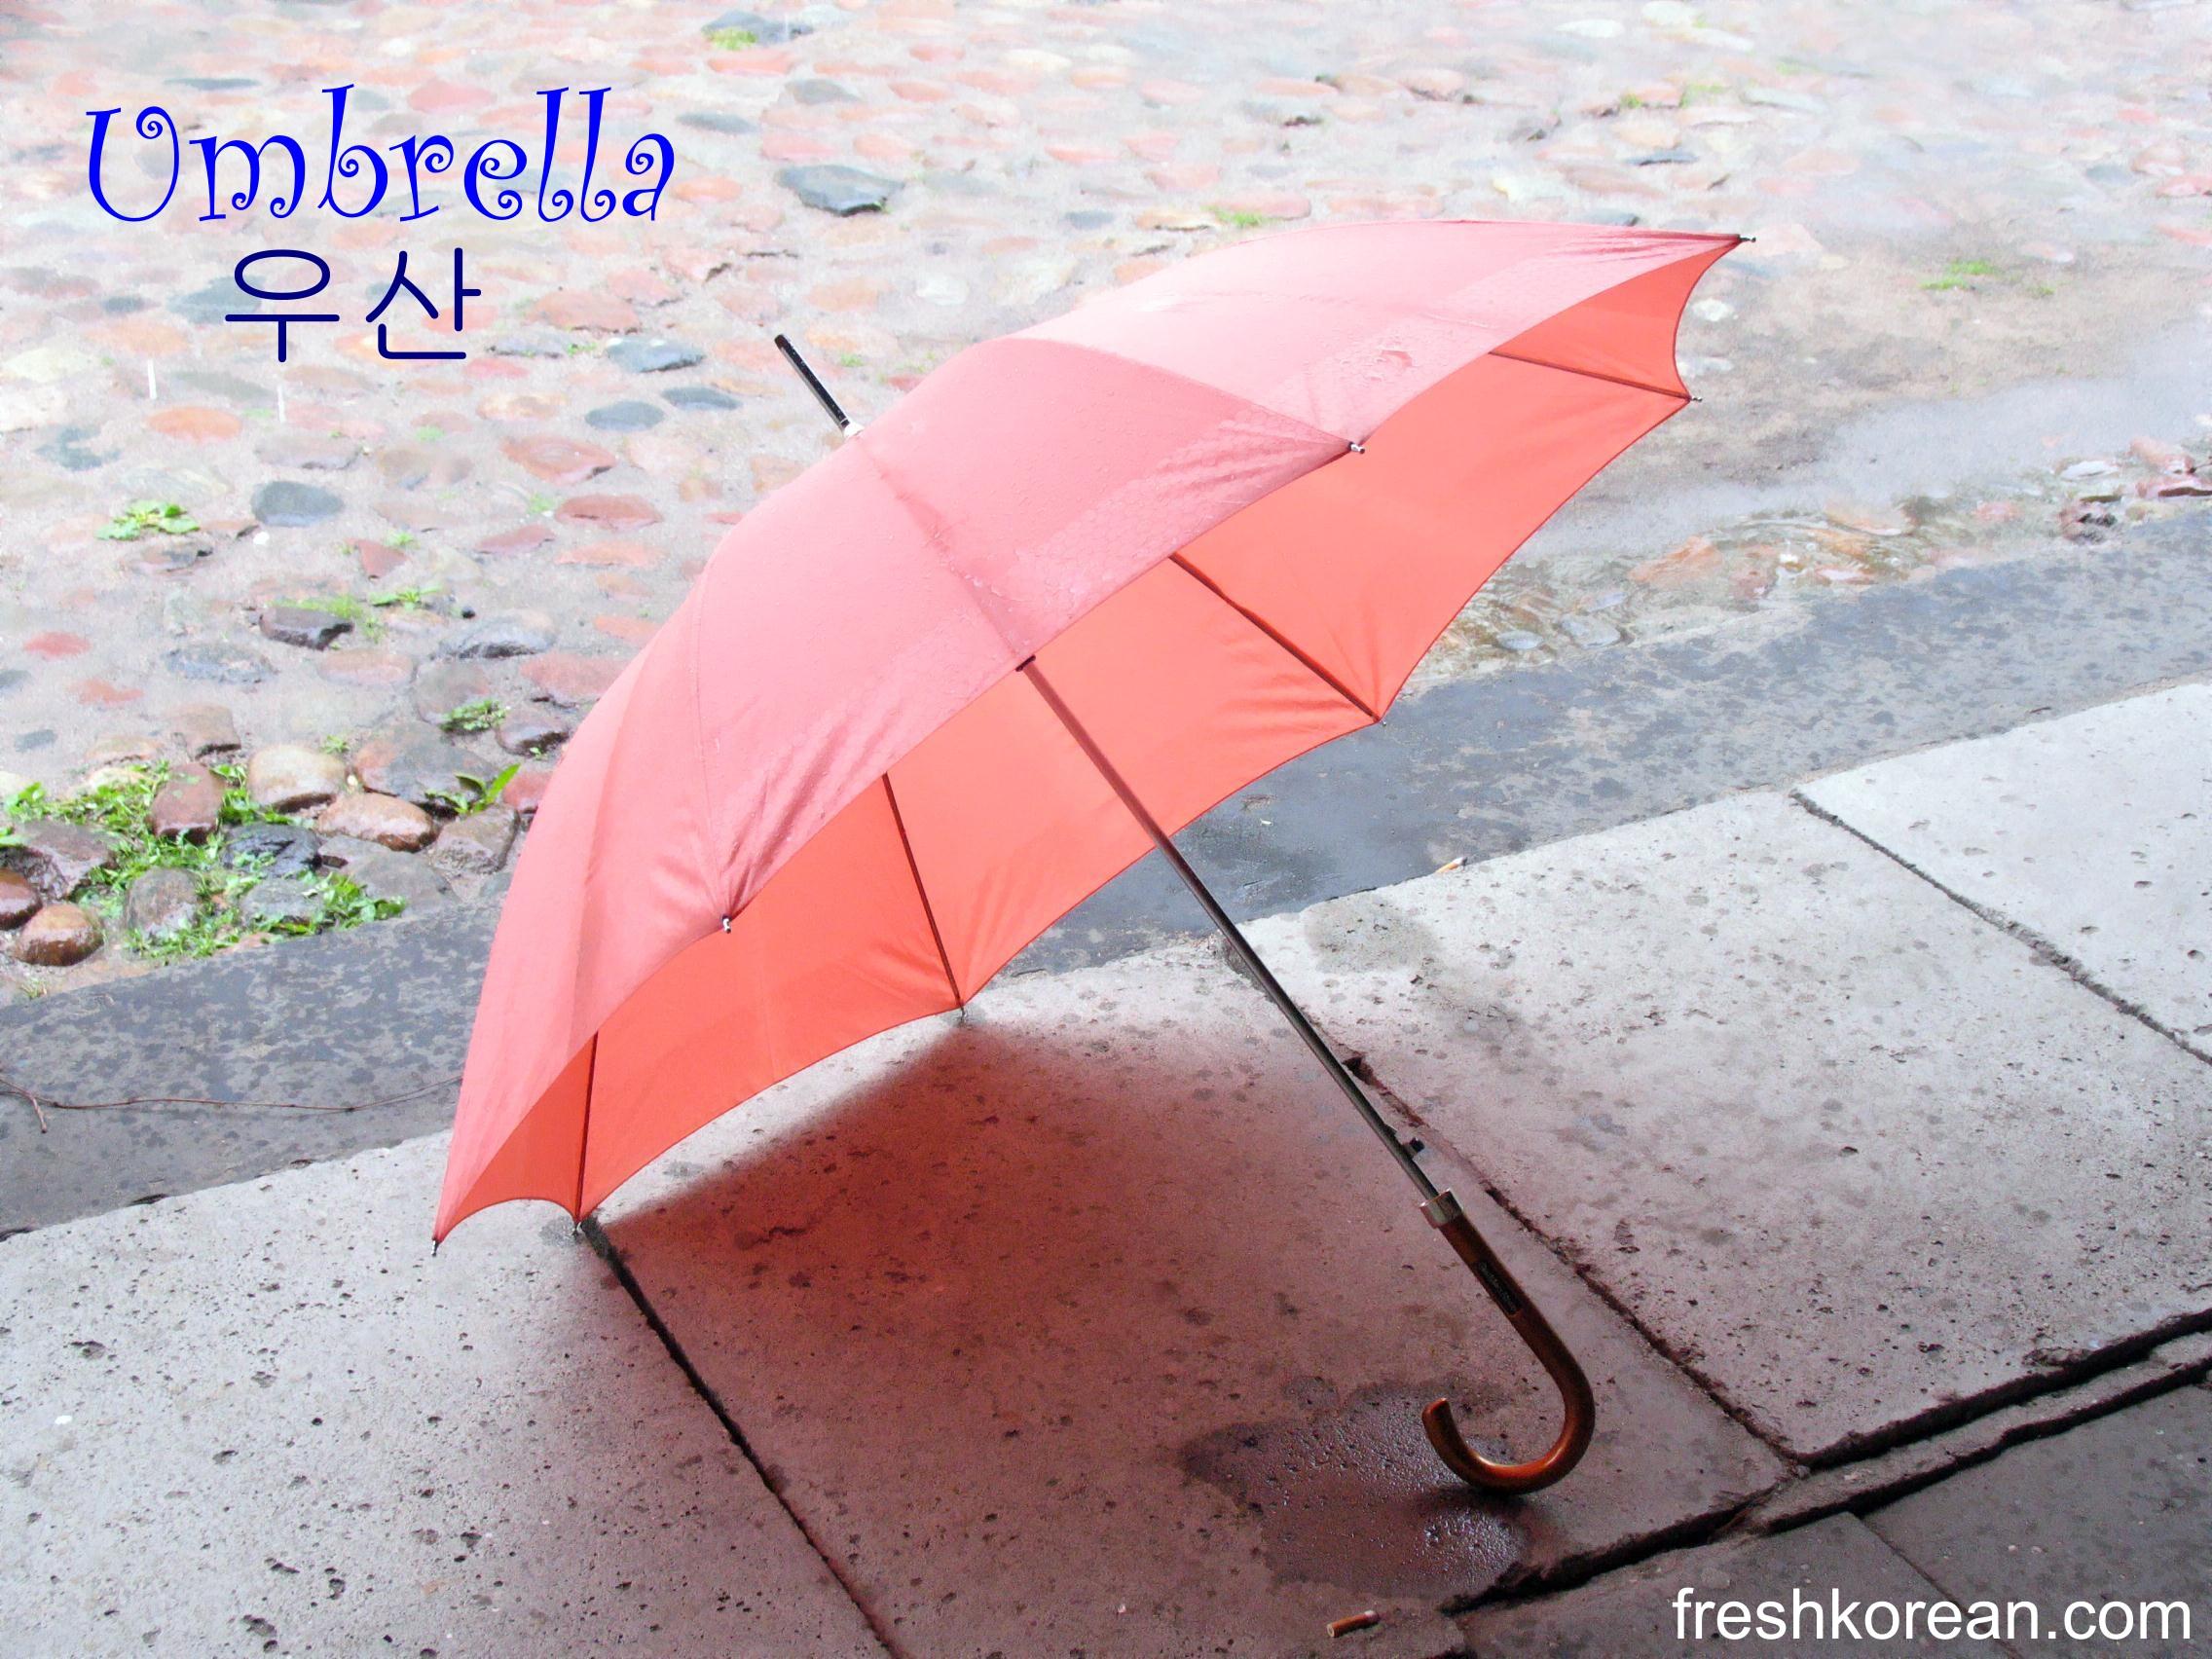 Umbrella Fresh Korean Word Of The Day For Saturday June 30th